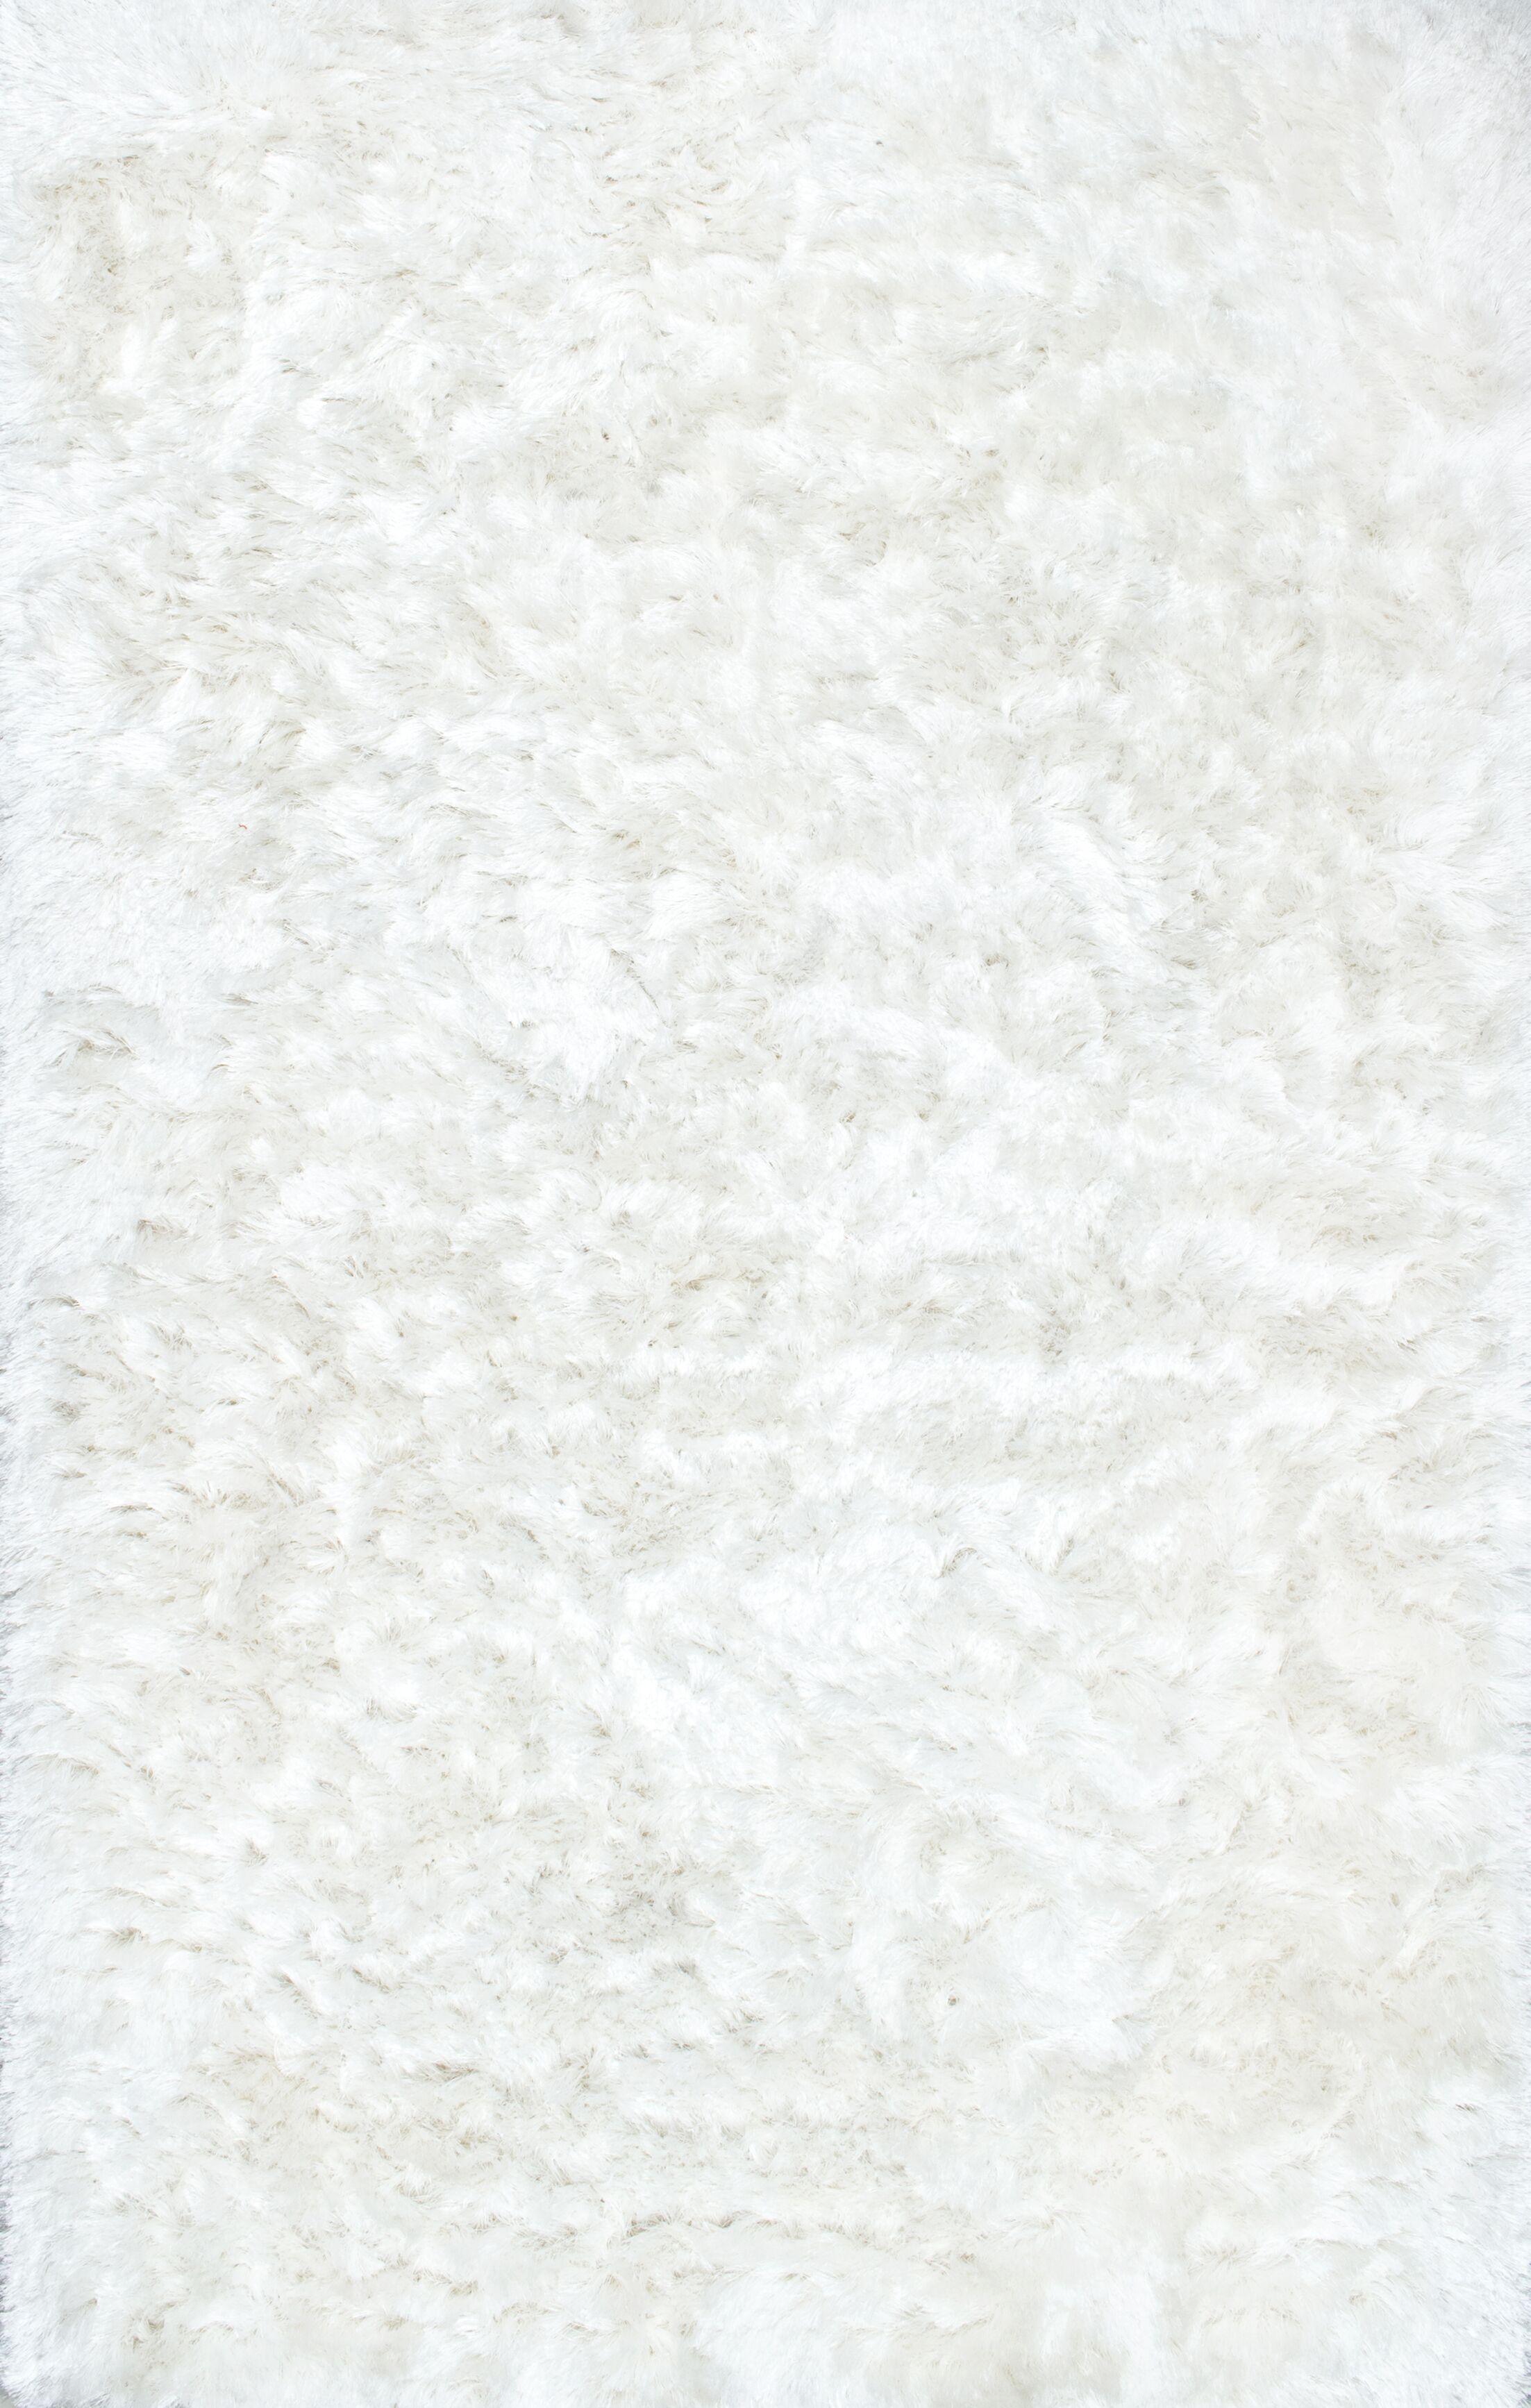 Sisyphus Hand-Woven White Area Rug Rug Size: Rectangle 3' x 5'